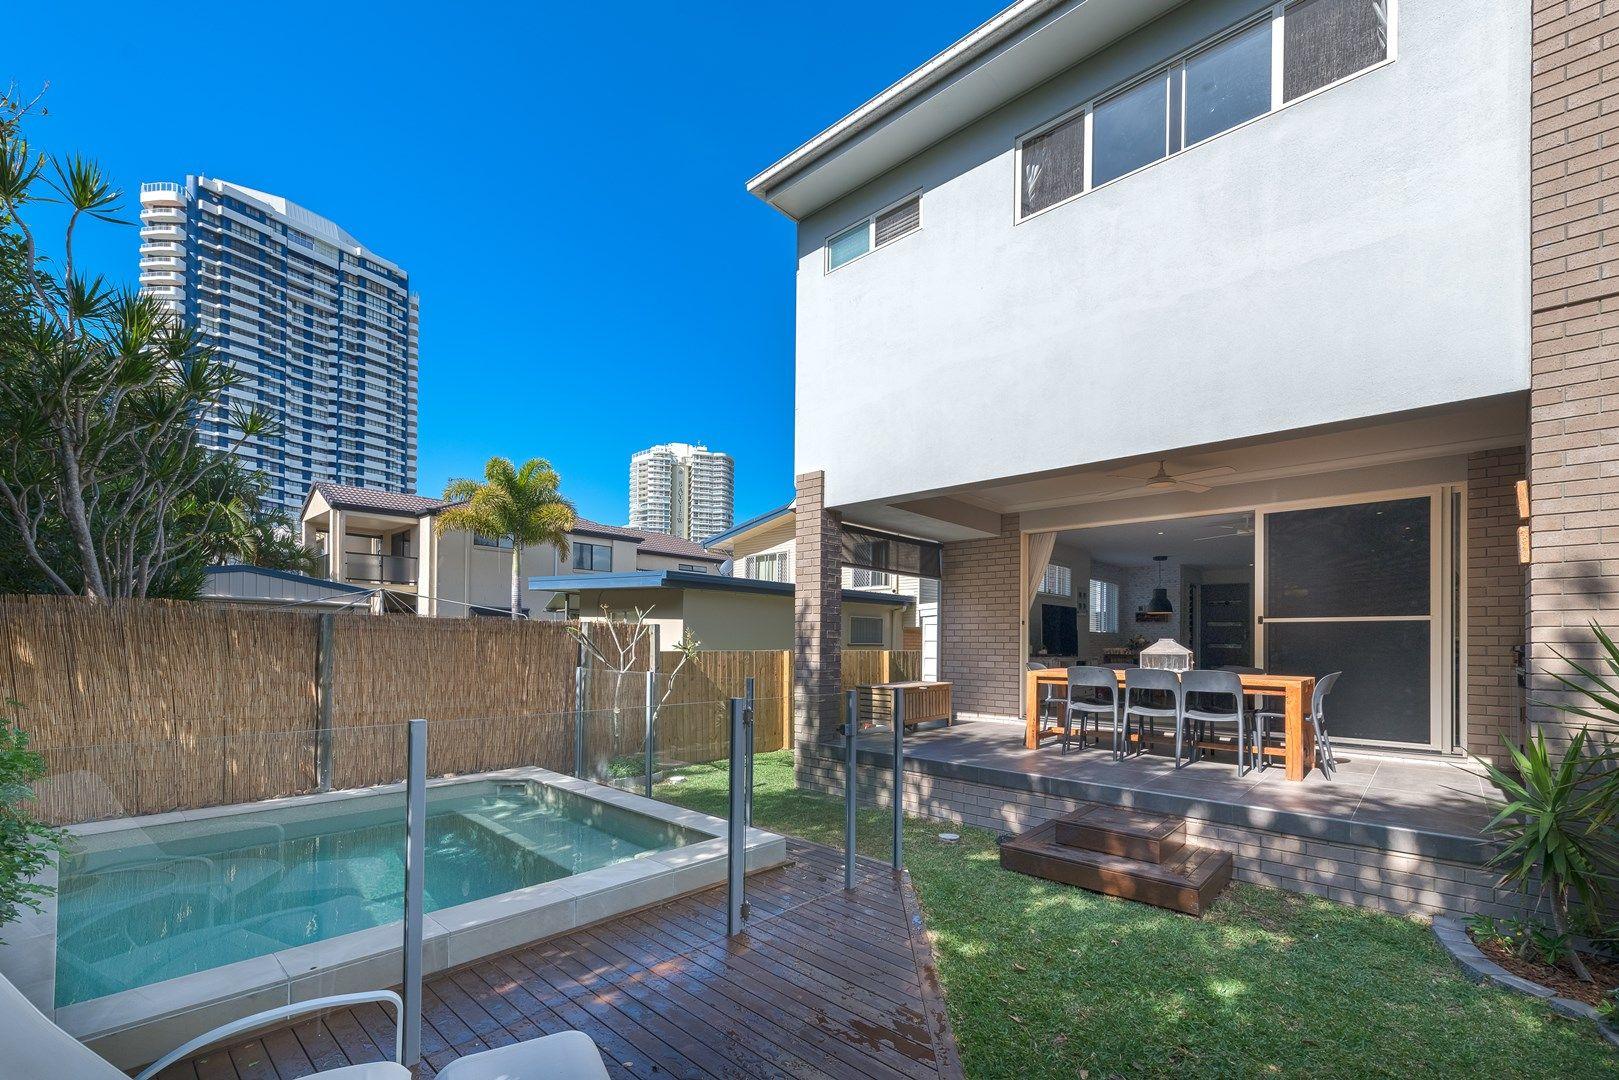 2/15 Broadwater Street, Runaway Bay QLD 4216, Image 0